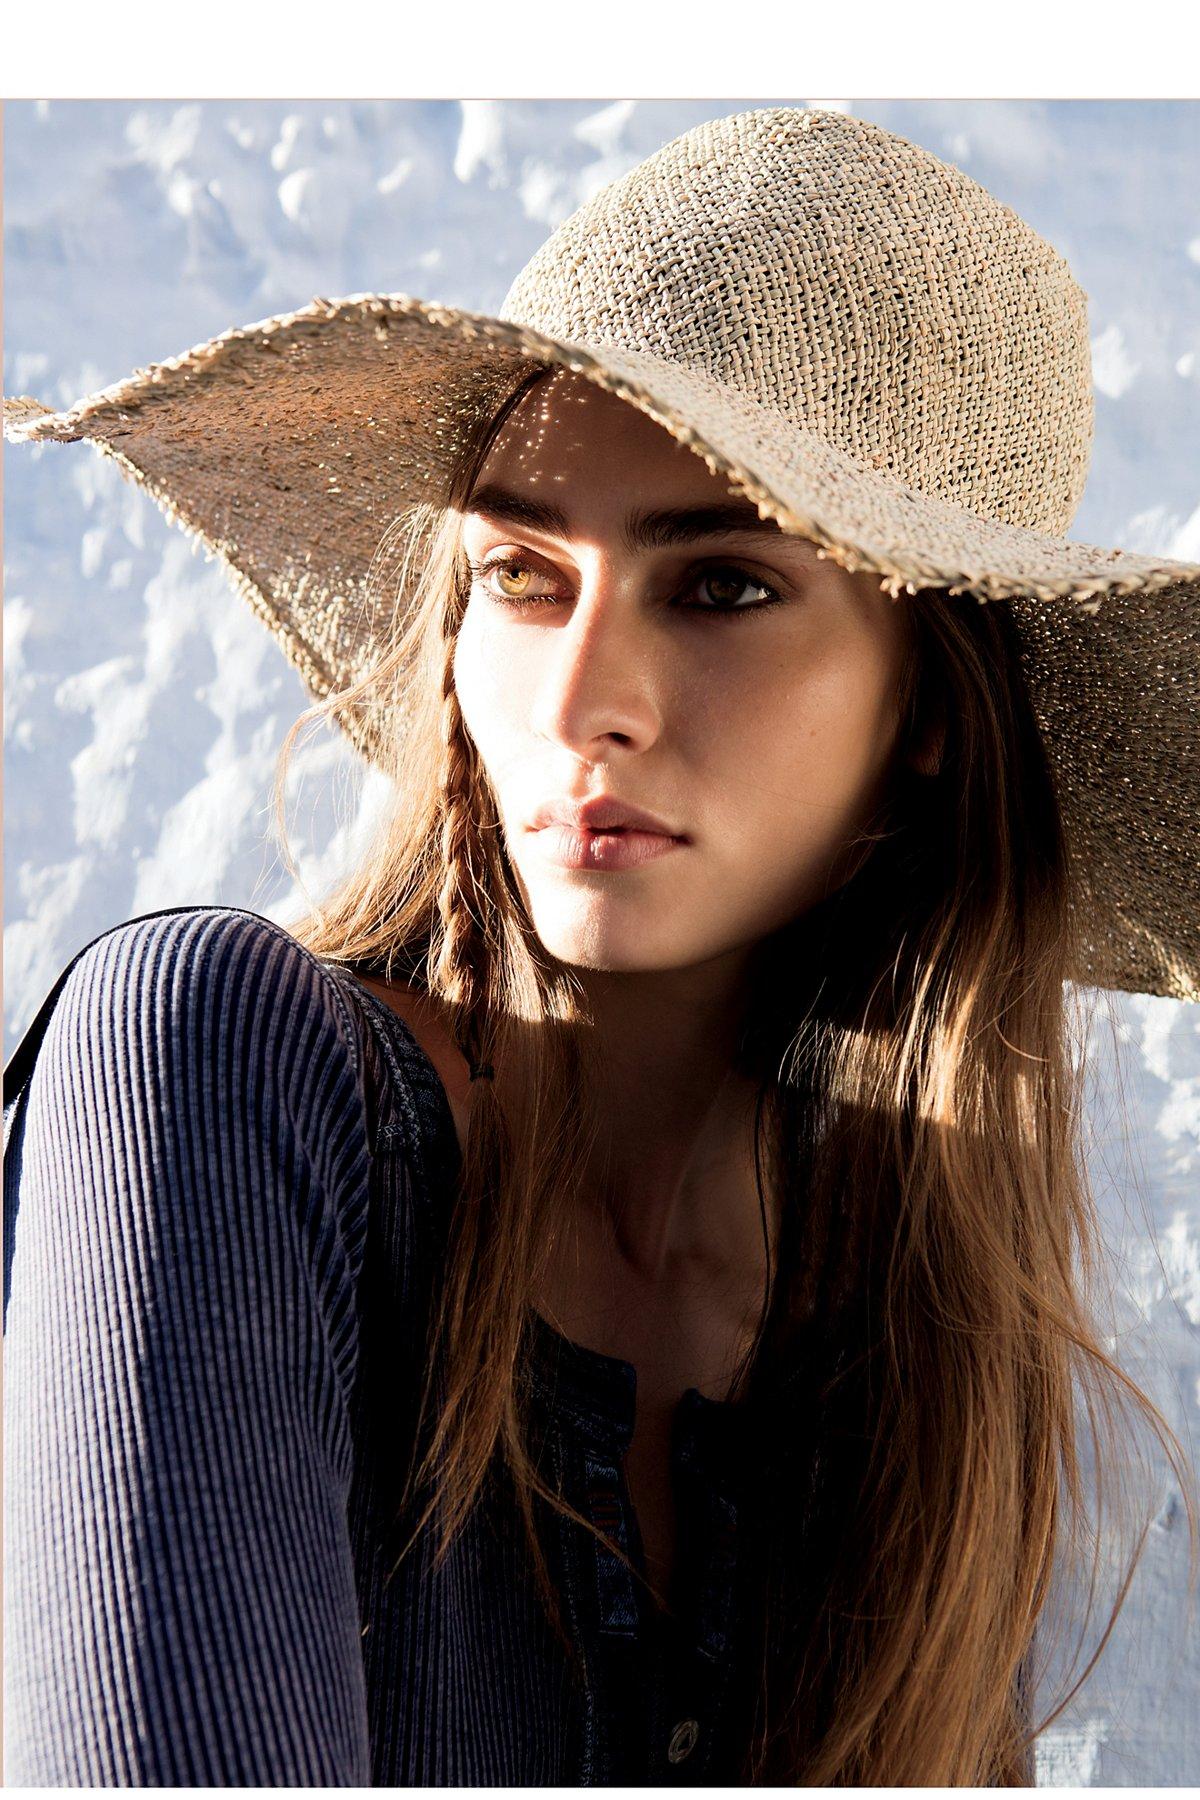 Agretti Sea Straw Wide Brim Hat